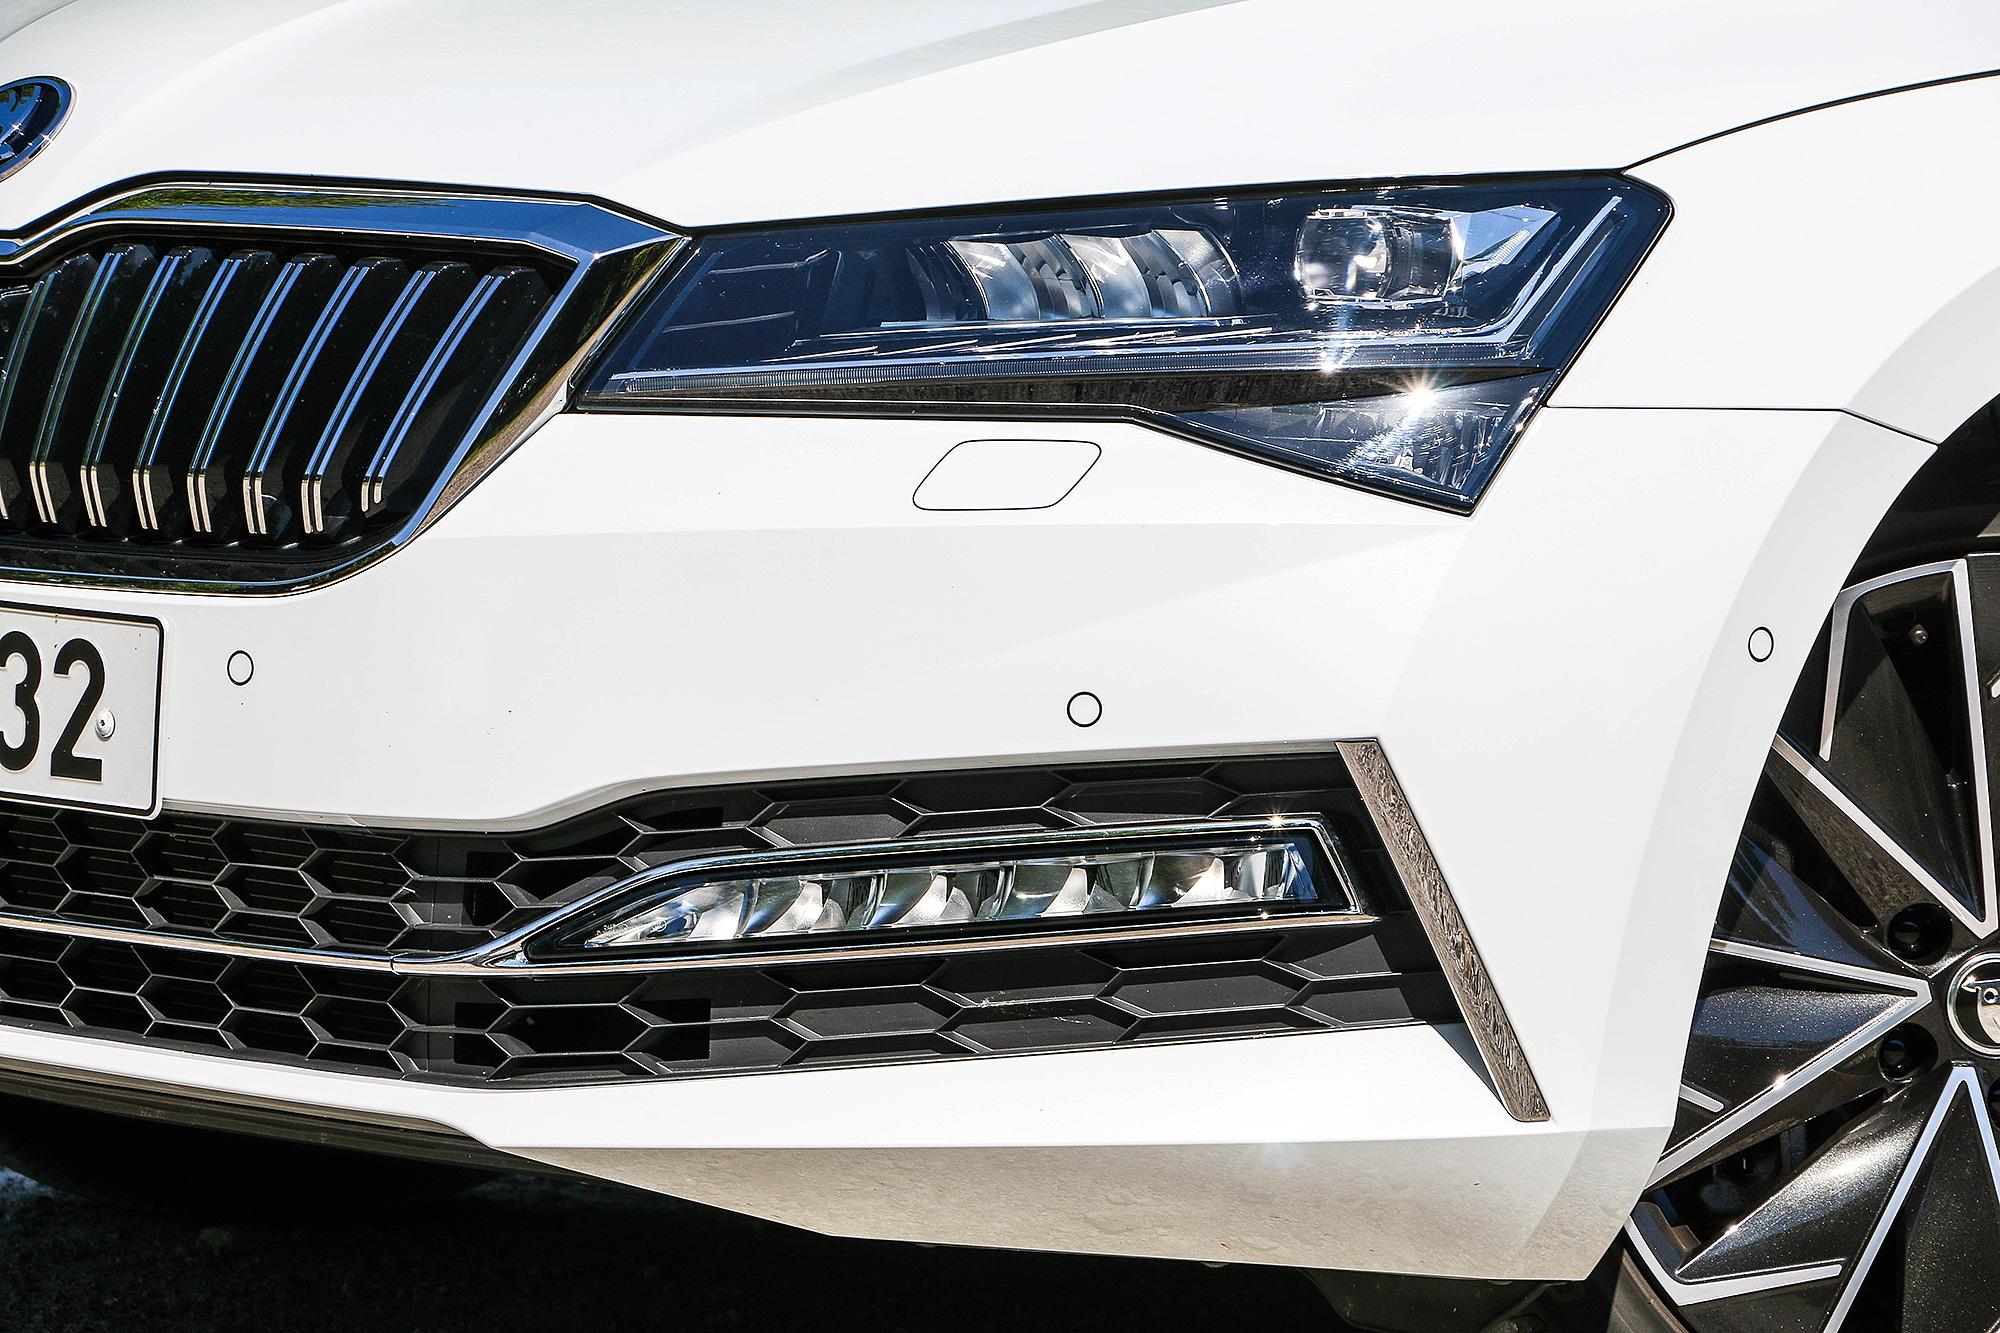 試駕車配備 Matrix LED 矩陣式 LED 頭燈。